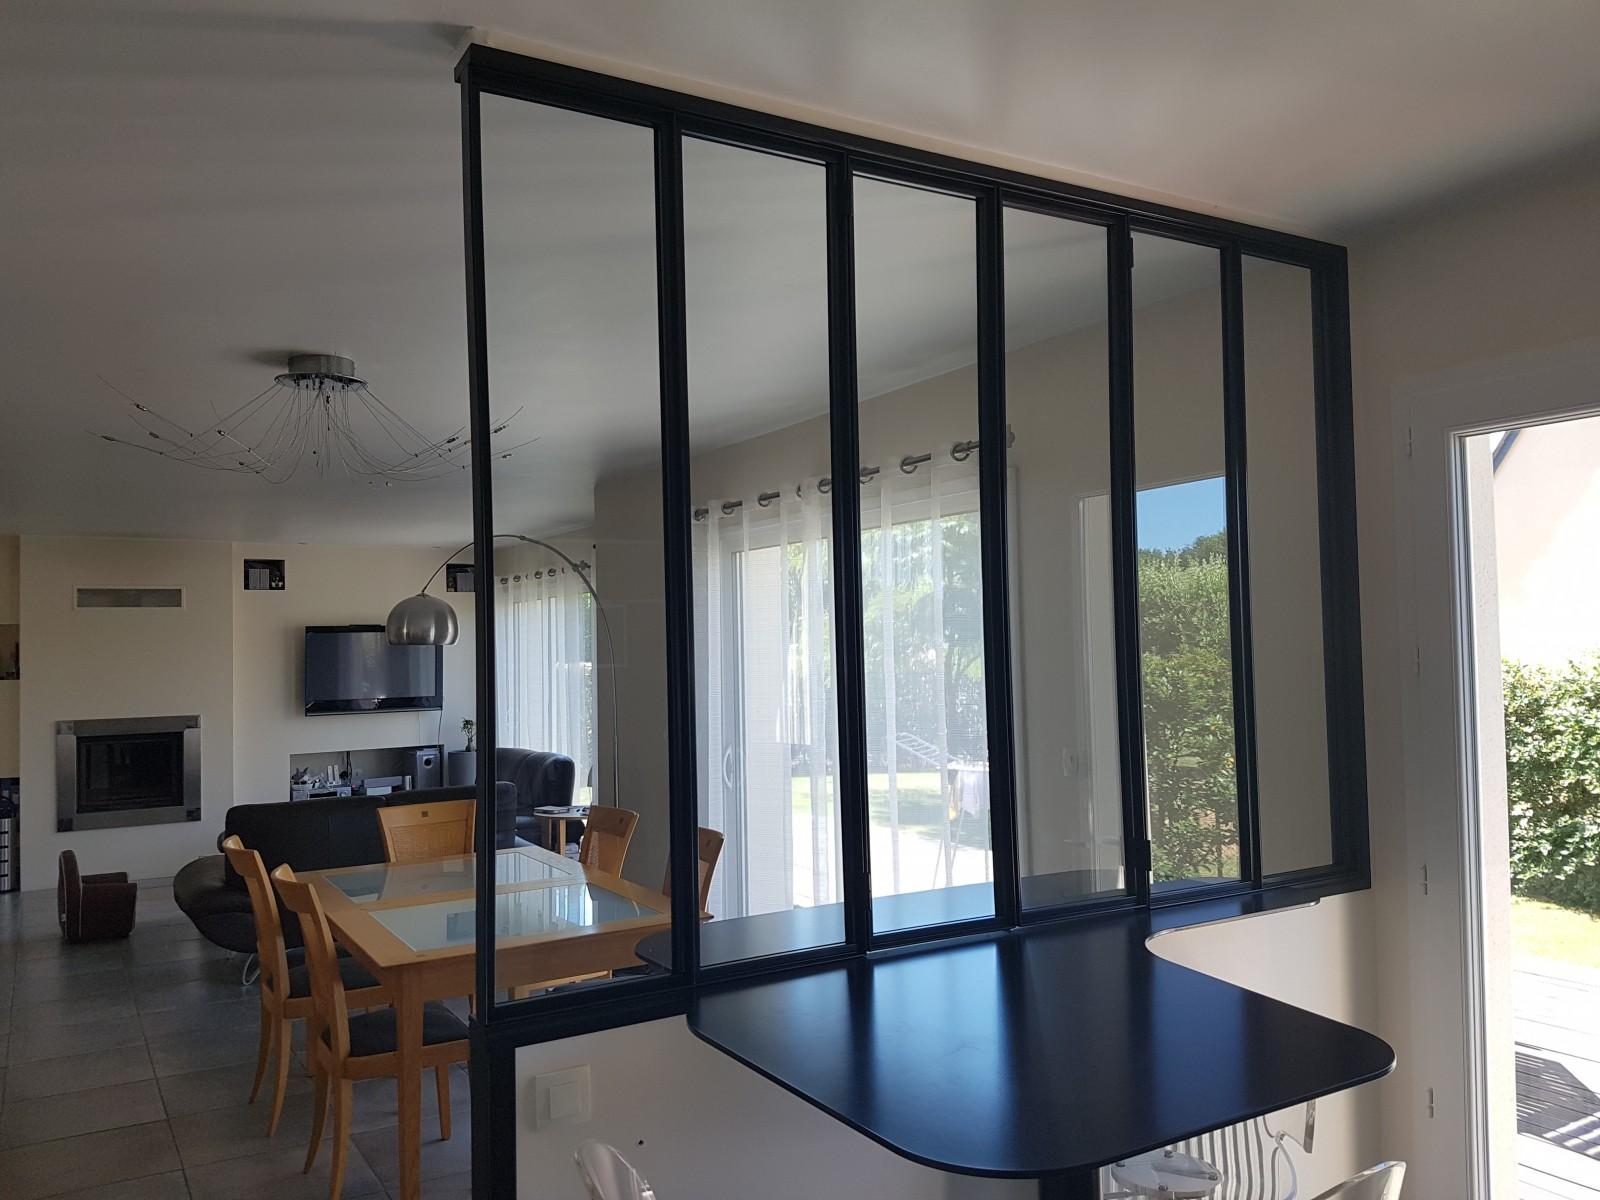 Cloison vitr e d atelier for Verriere cloison vitree